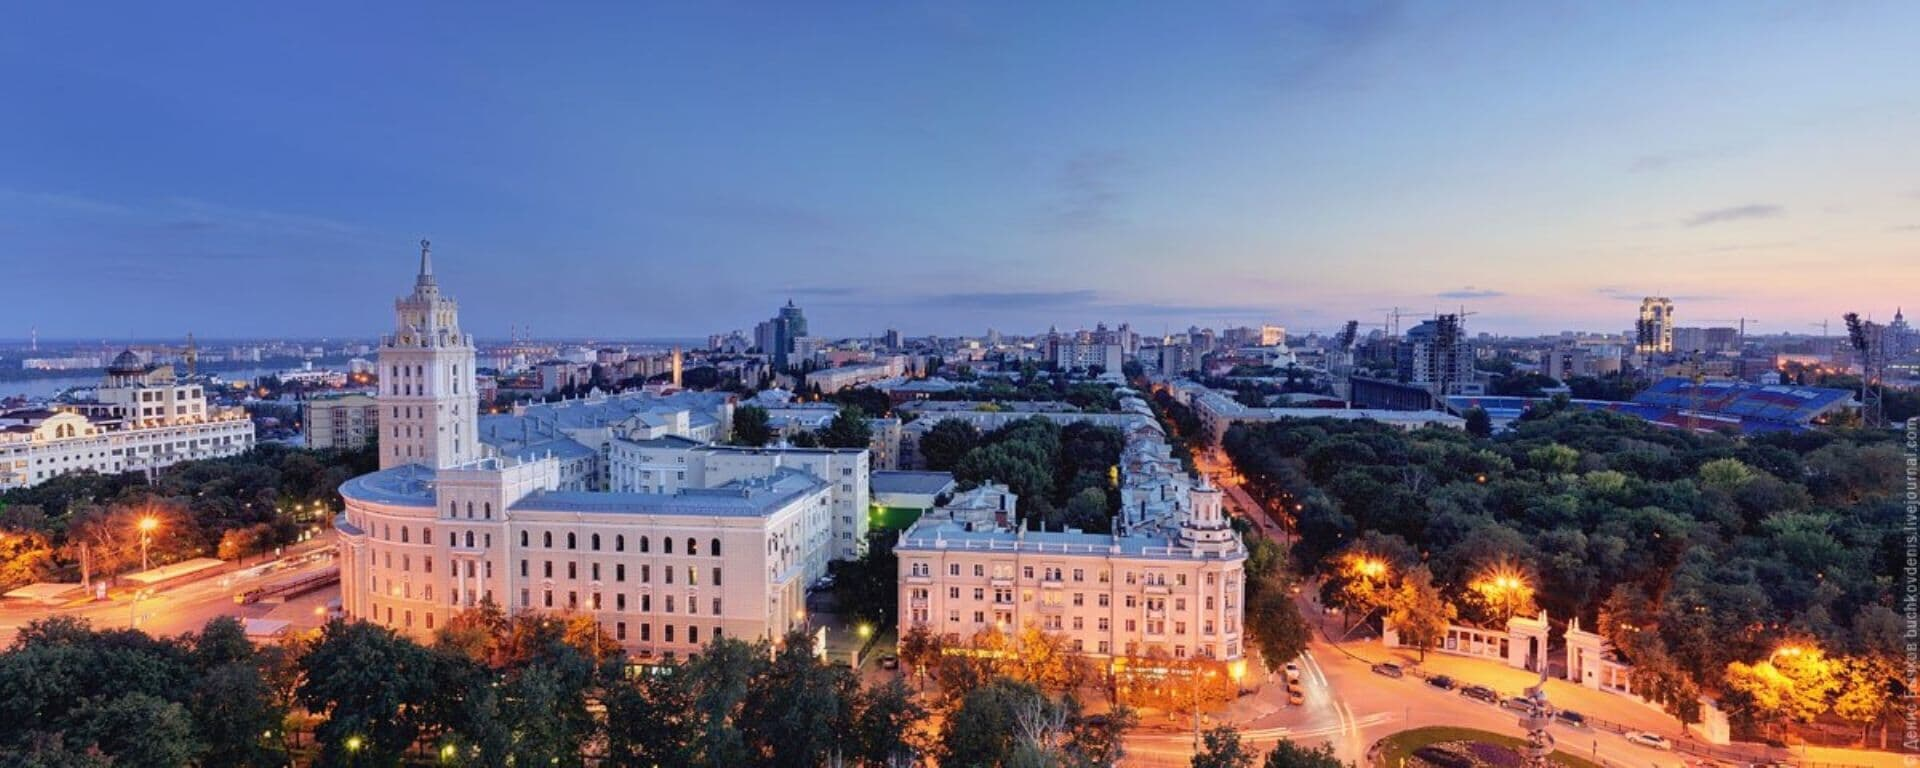 Voronezh photo